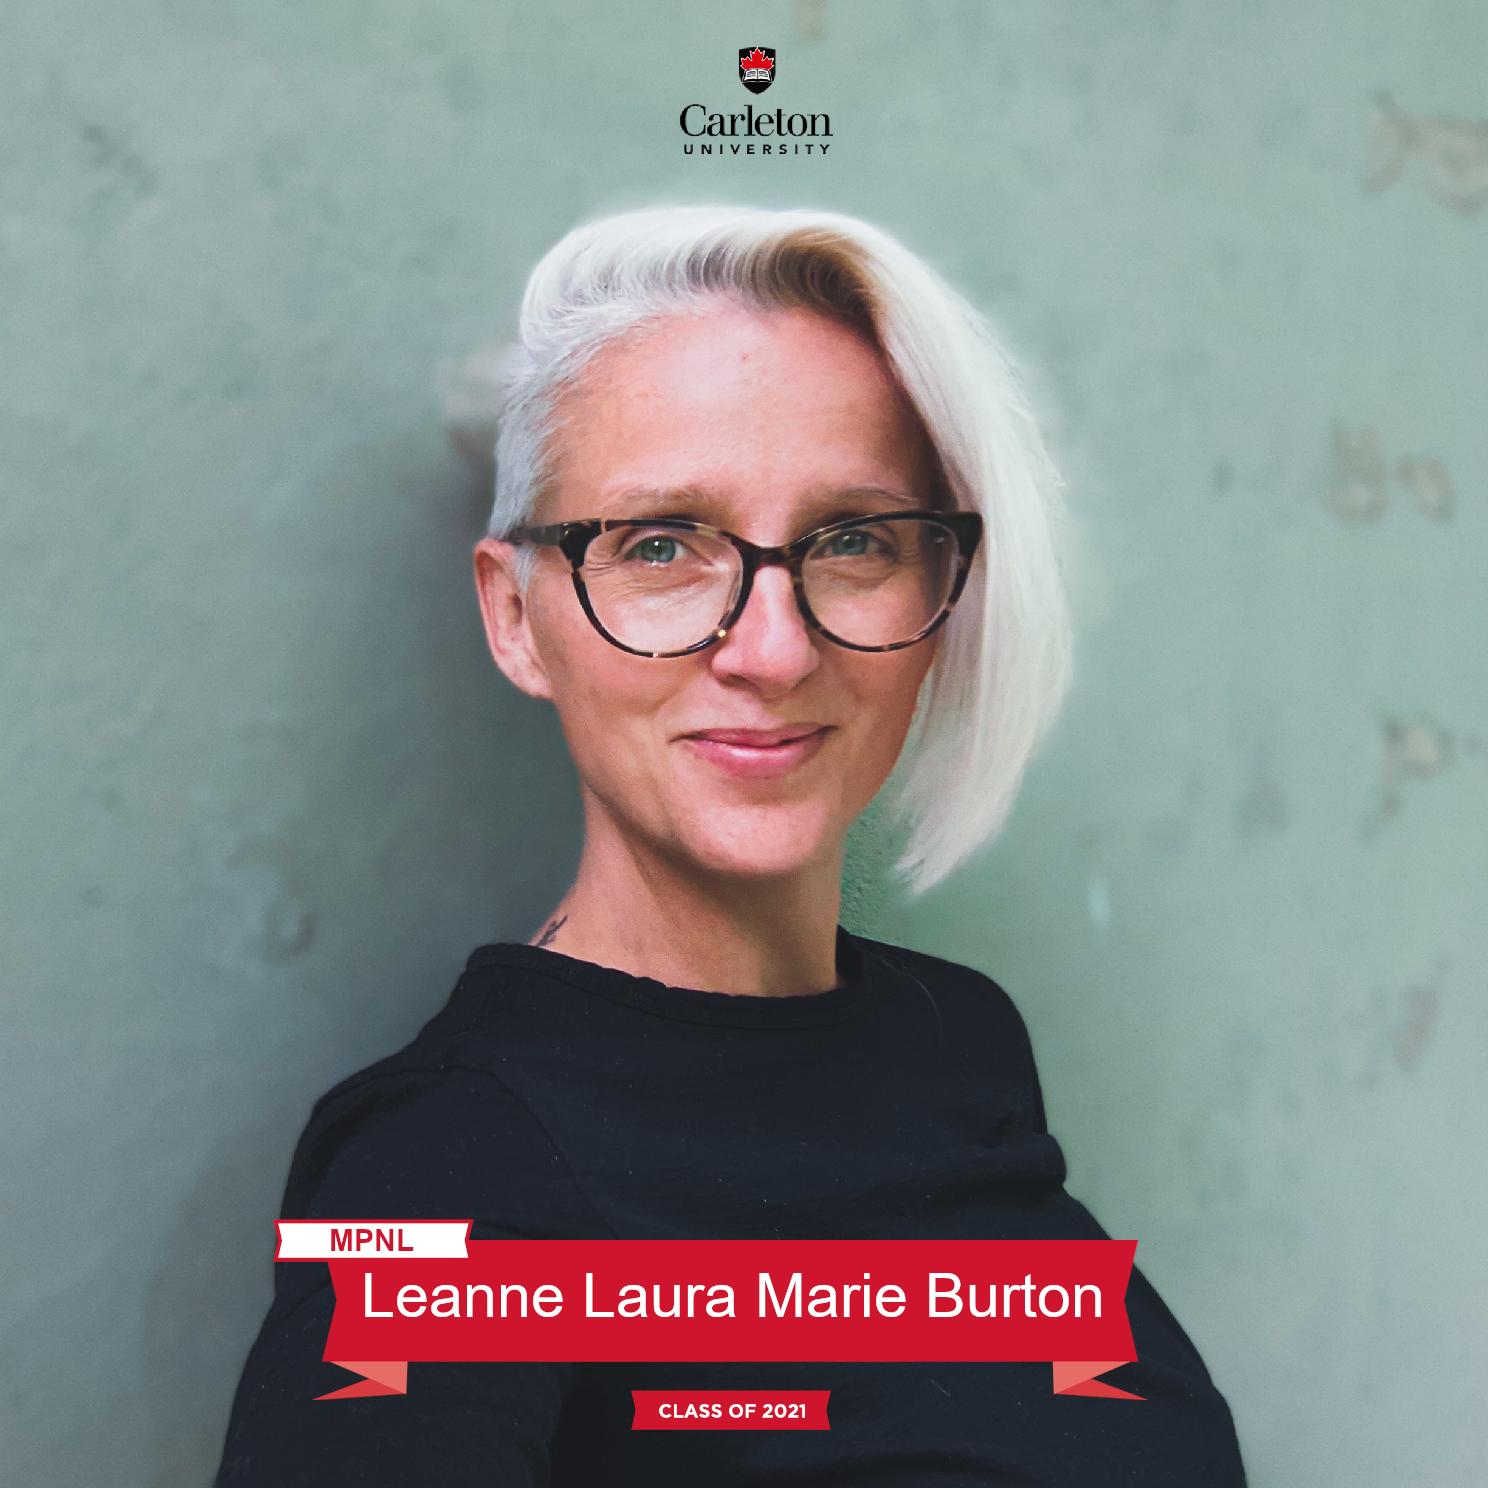 Leanne Laura Marie Burton. MPNL graduate, class of 2021